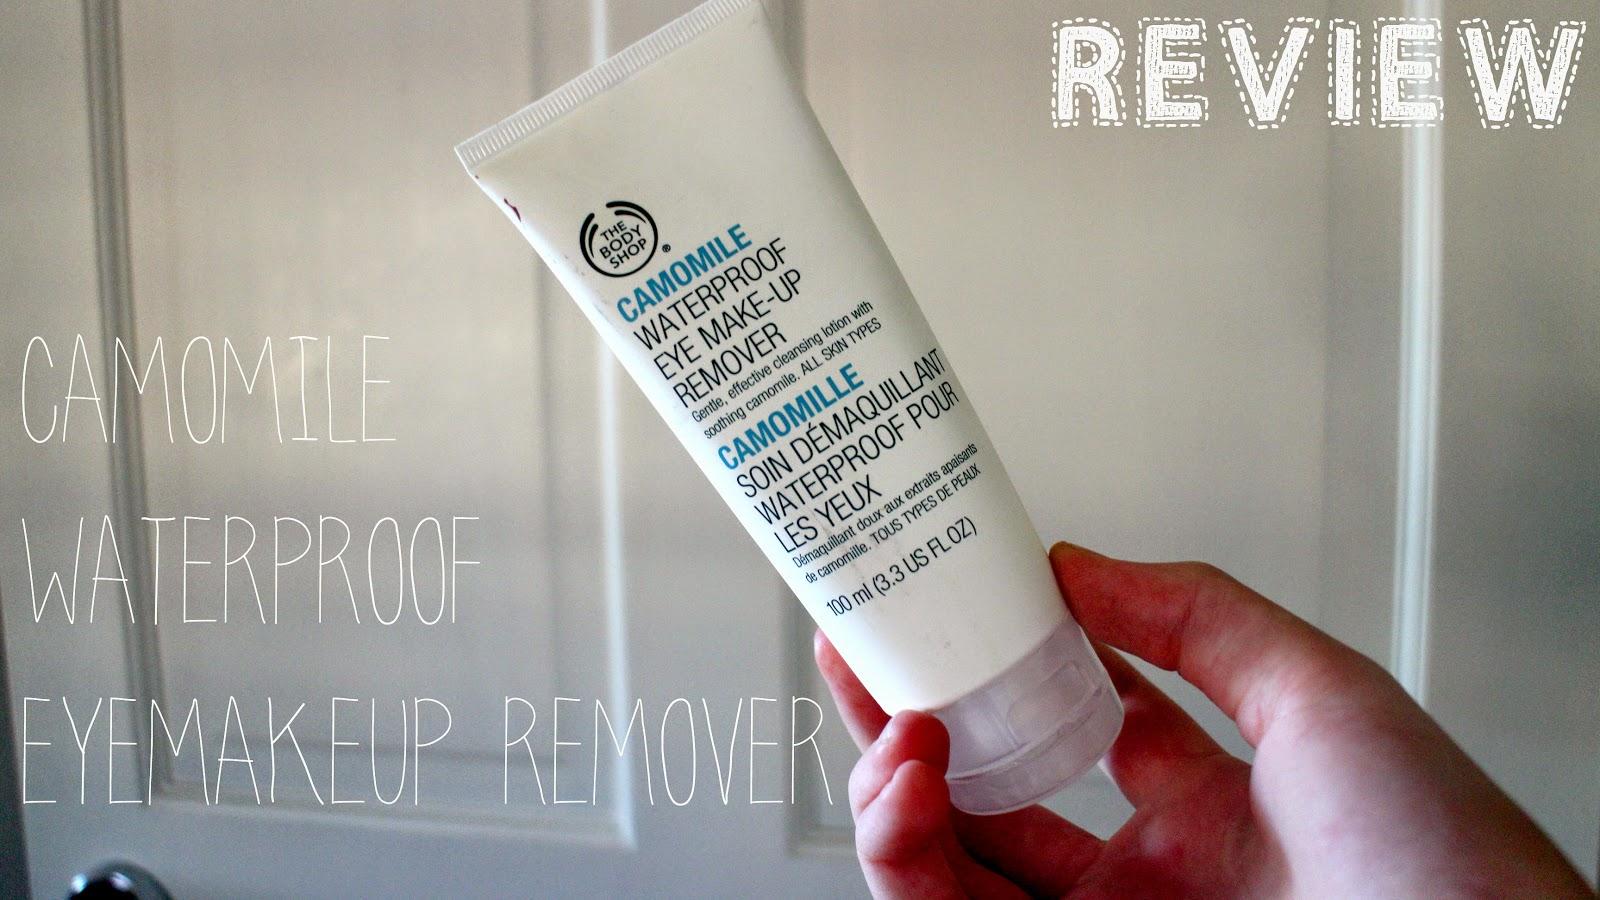 Camomile waterproof eye makeup remover // R E V I E W